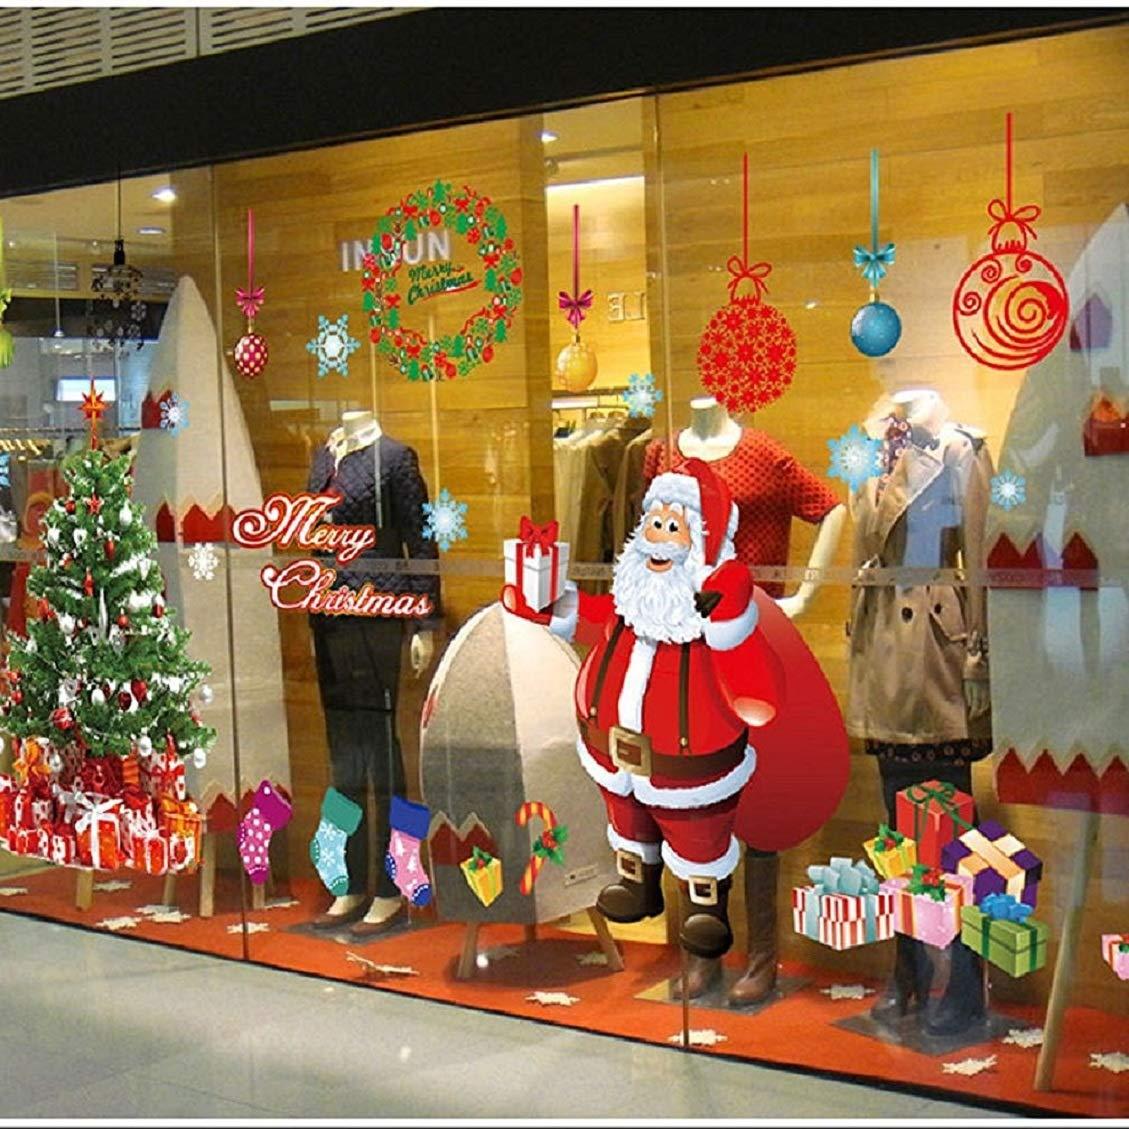 Tuopuda Christmas Wall Sticker DIY Santa Claus Xmas Tree Window Home Decoration Christmas Santa Claus Sticker for Shop Window (A)